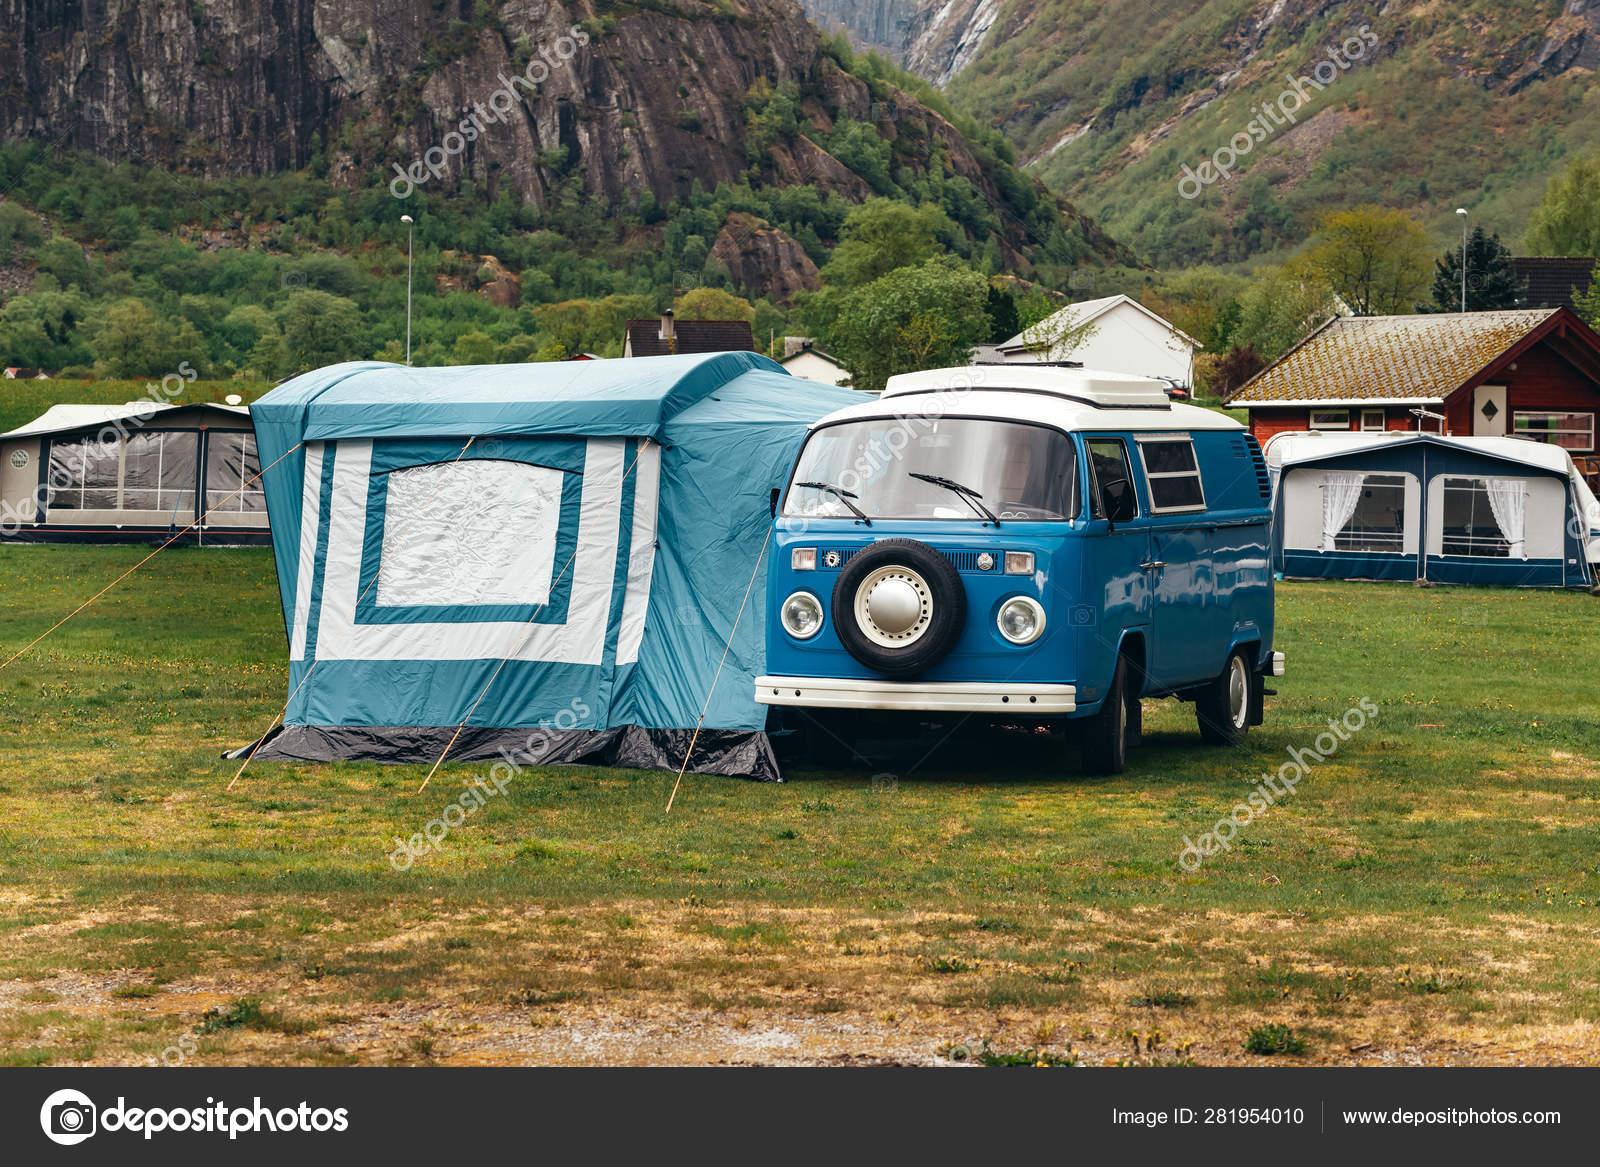 Car Hippie Tent Camping Stock Photo C Smarfik 281954010